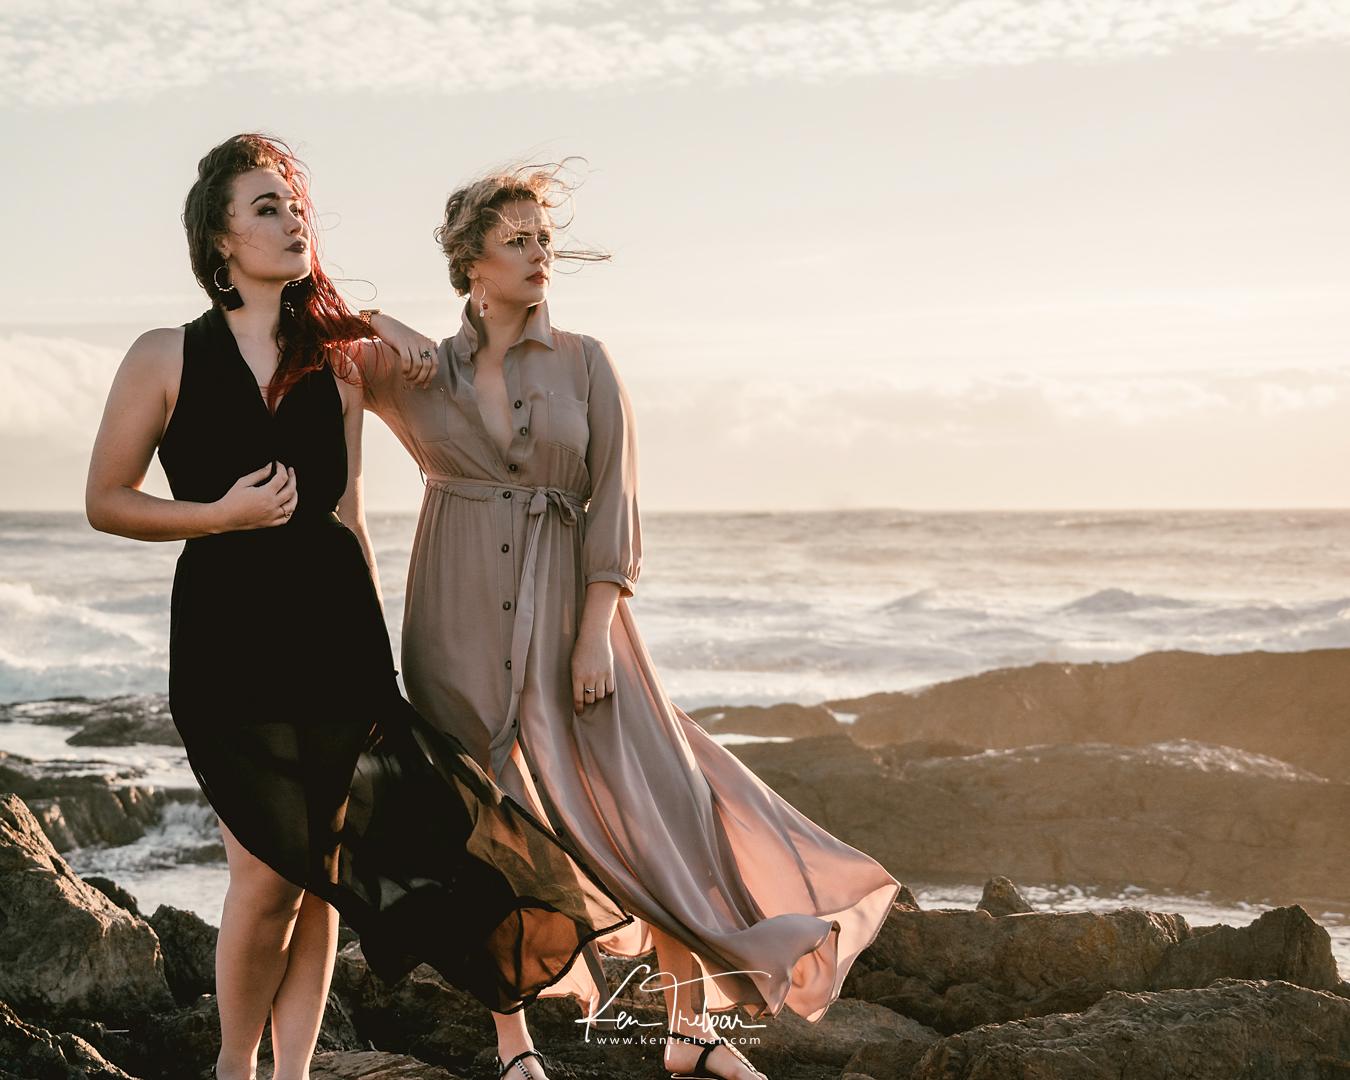 Ken Treloar Photography - Friends photoshoot Cape Town - Anna & Tahnee, Location 1-7 (Lo).jpg